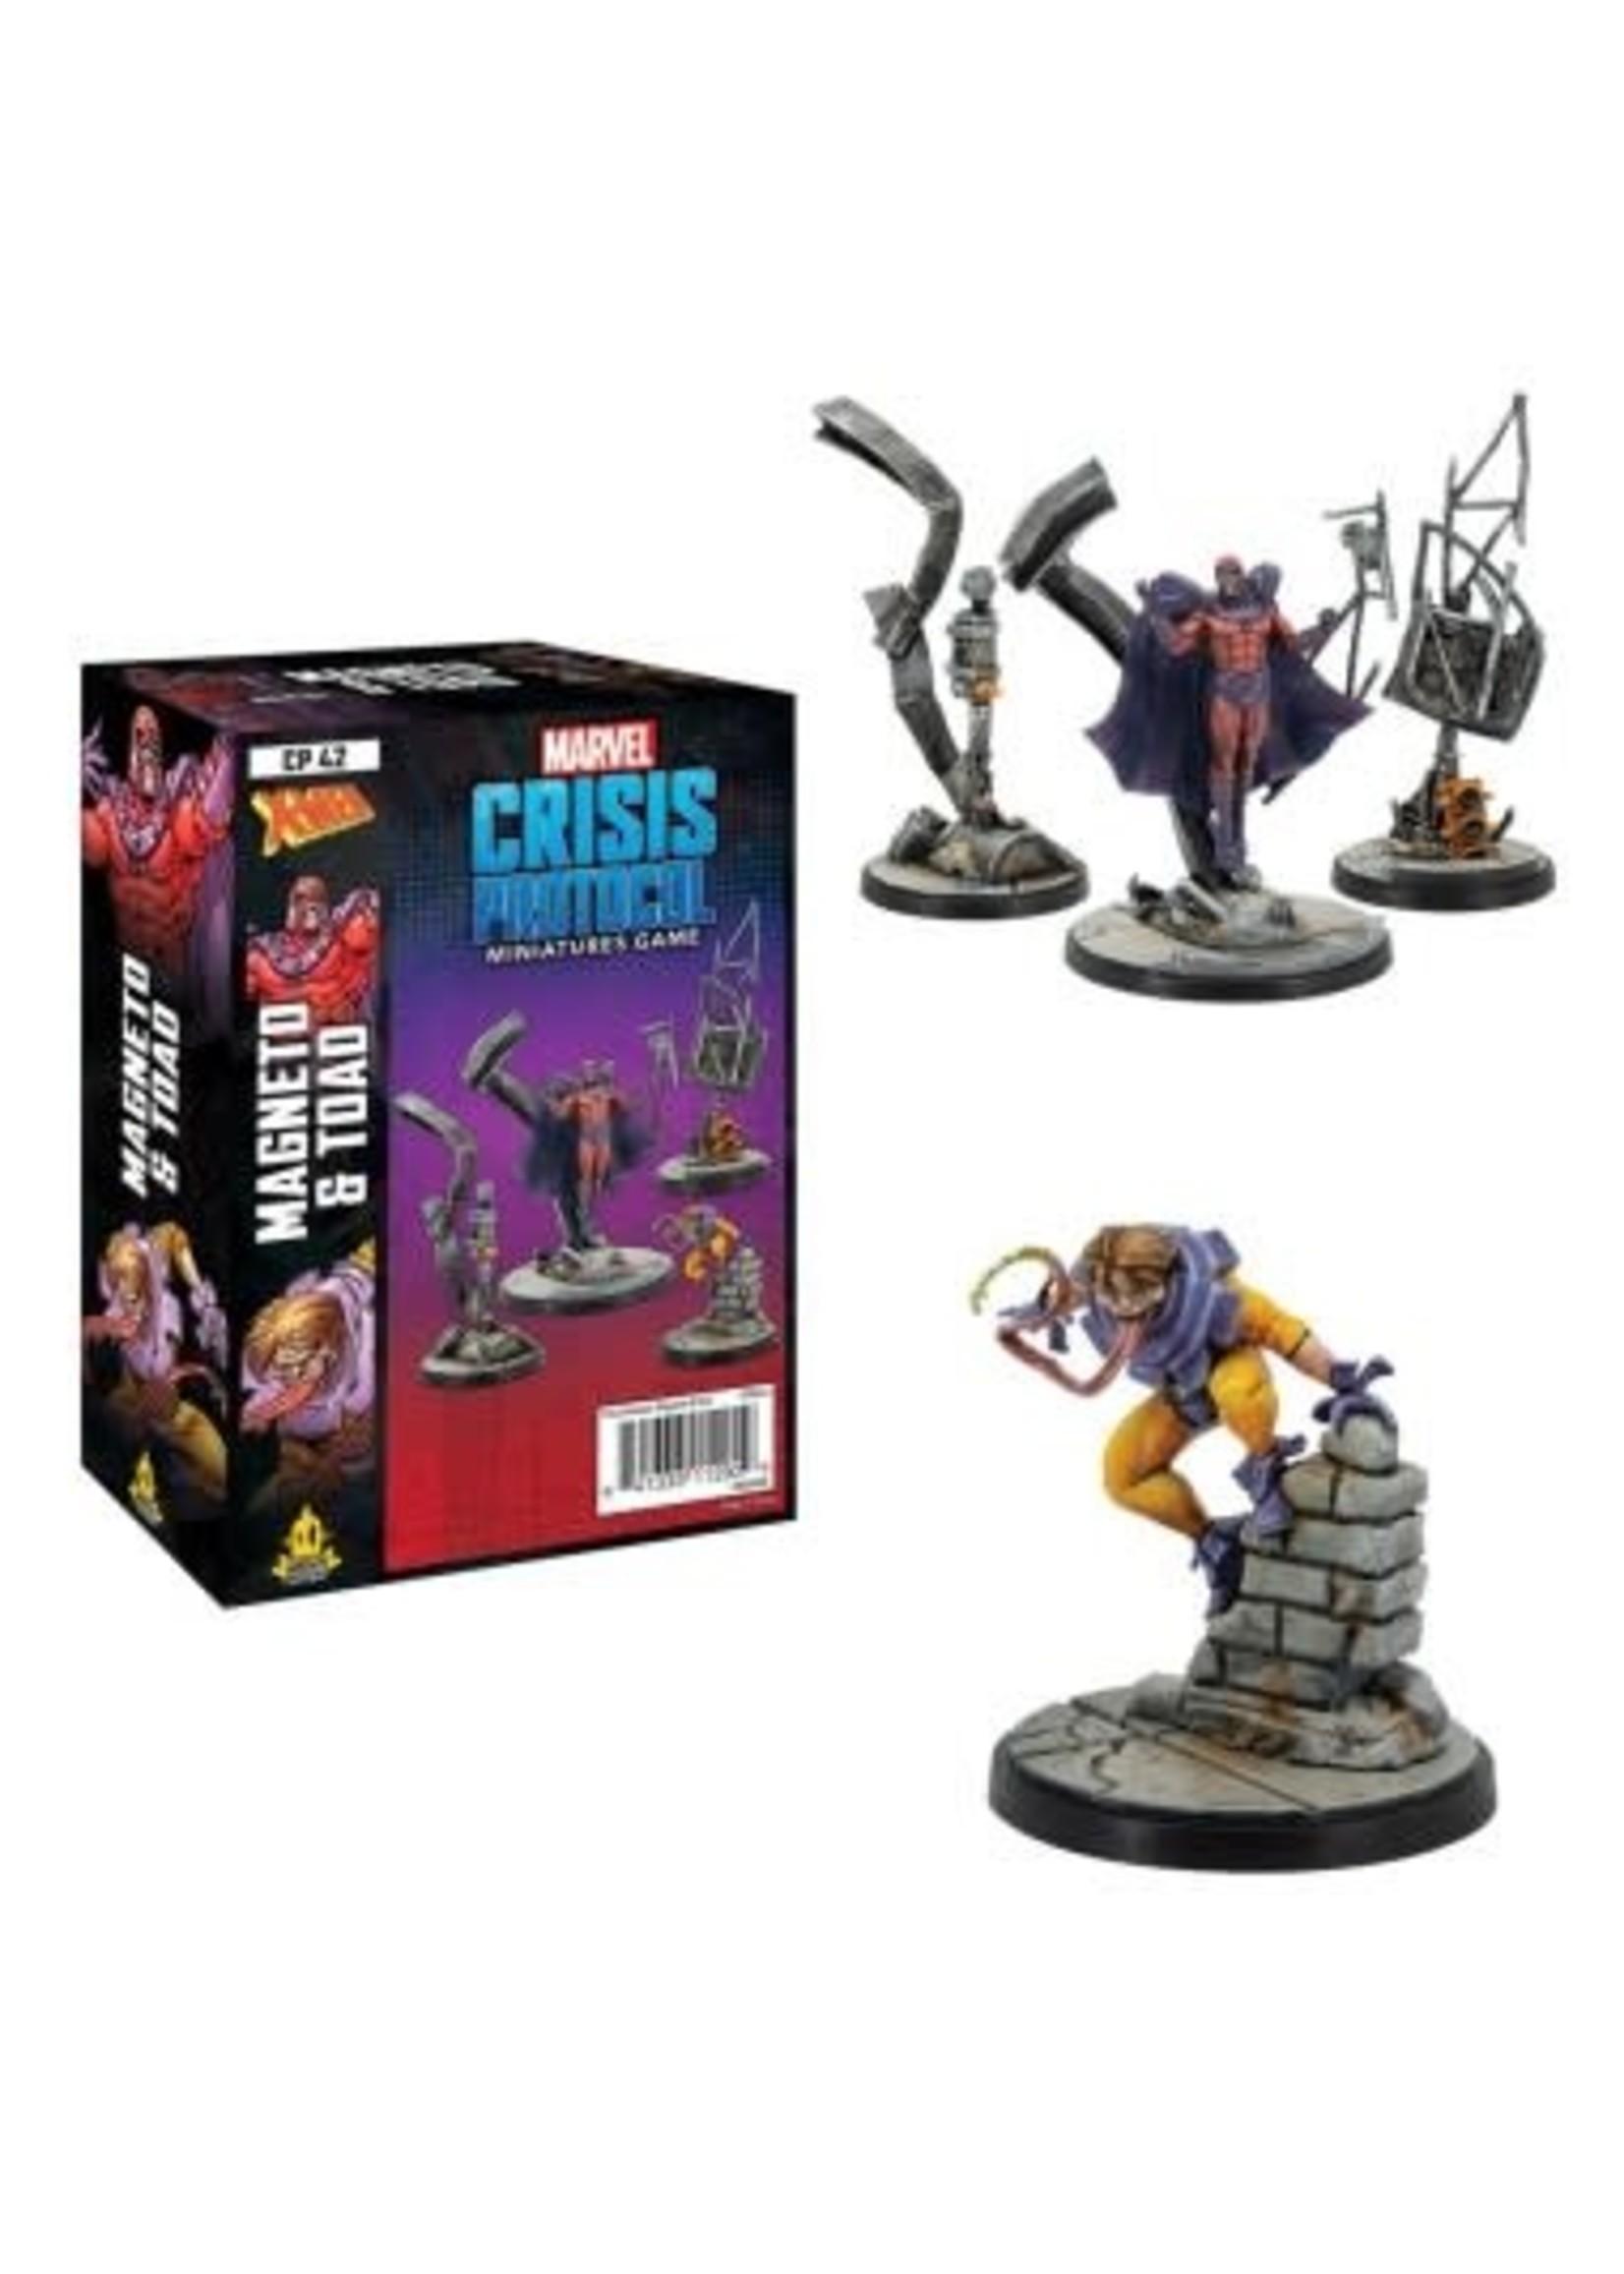 Atomic Mass Games Marvel Crisis Protocol: Magneto & Toad